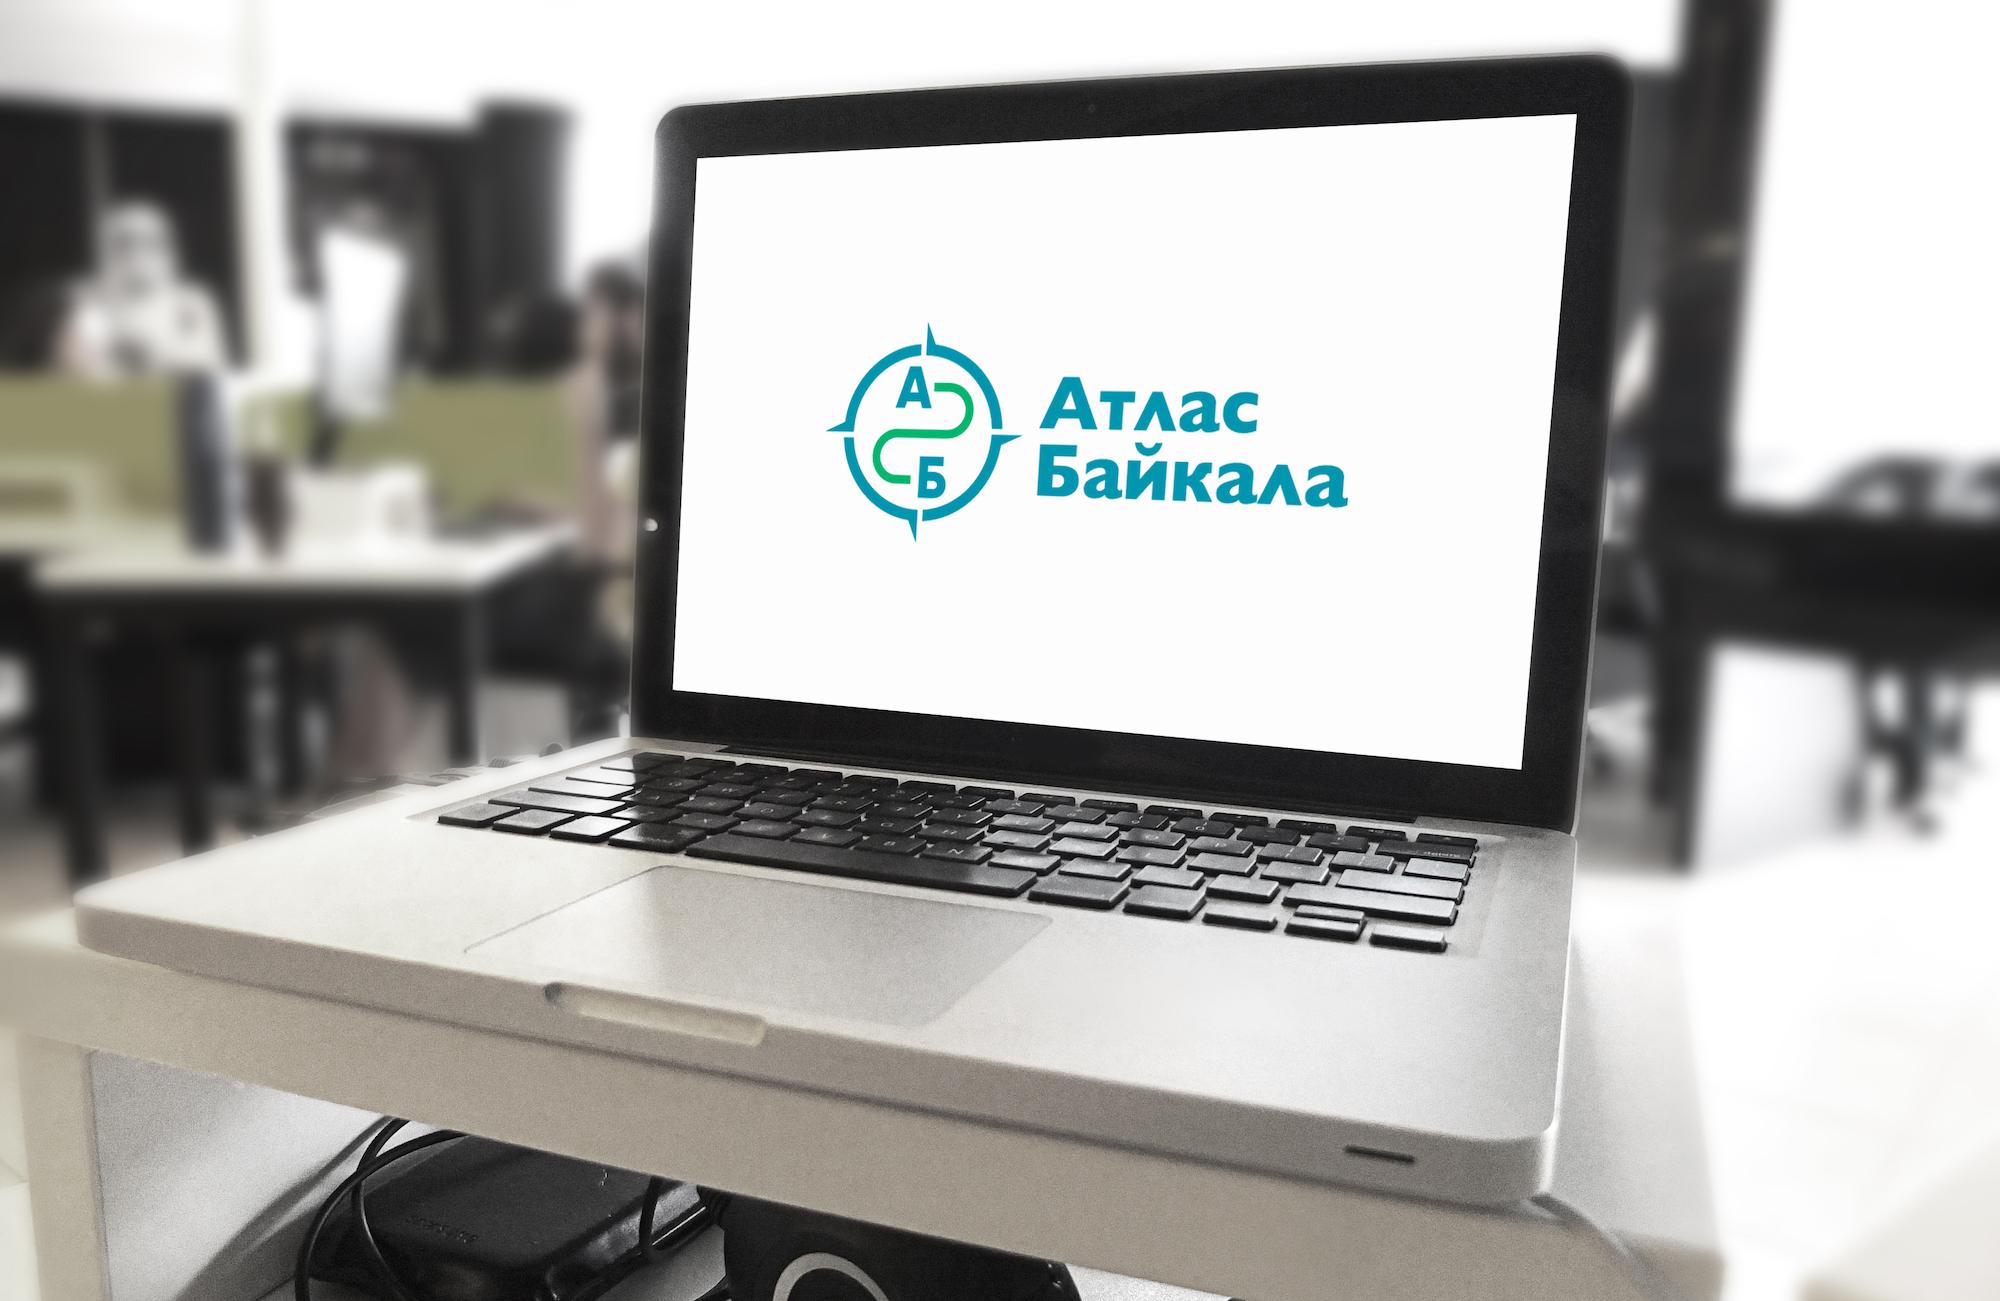 Разработка логотипа Атлас Байкала фото f_7755b0f59a289e3c.jpg